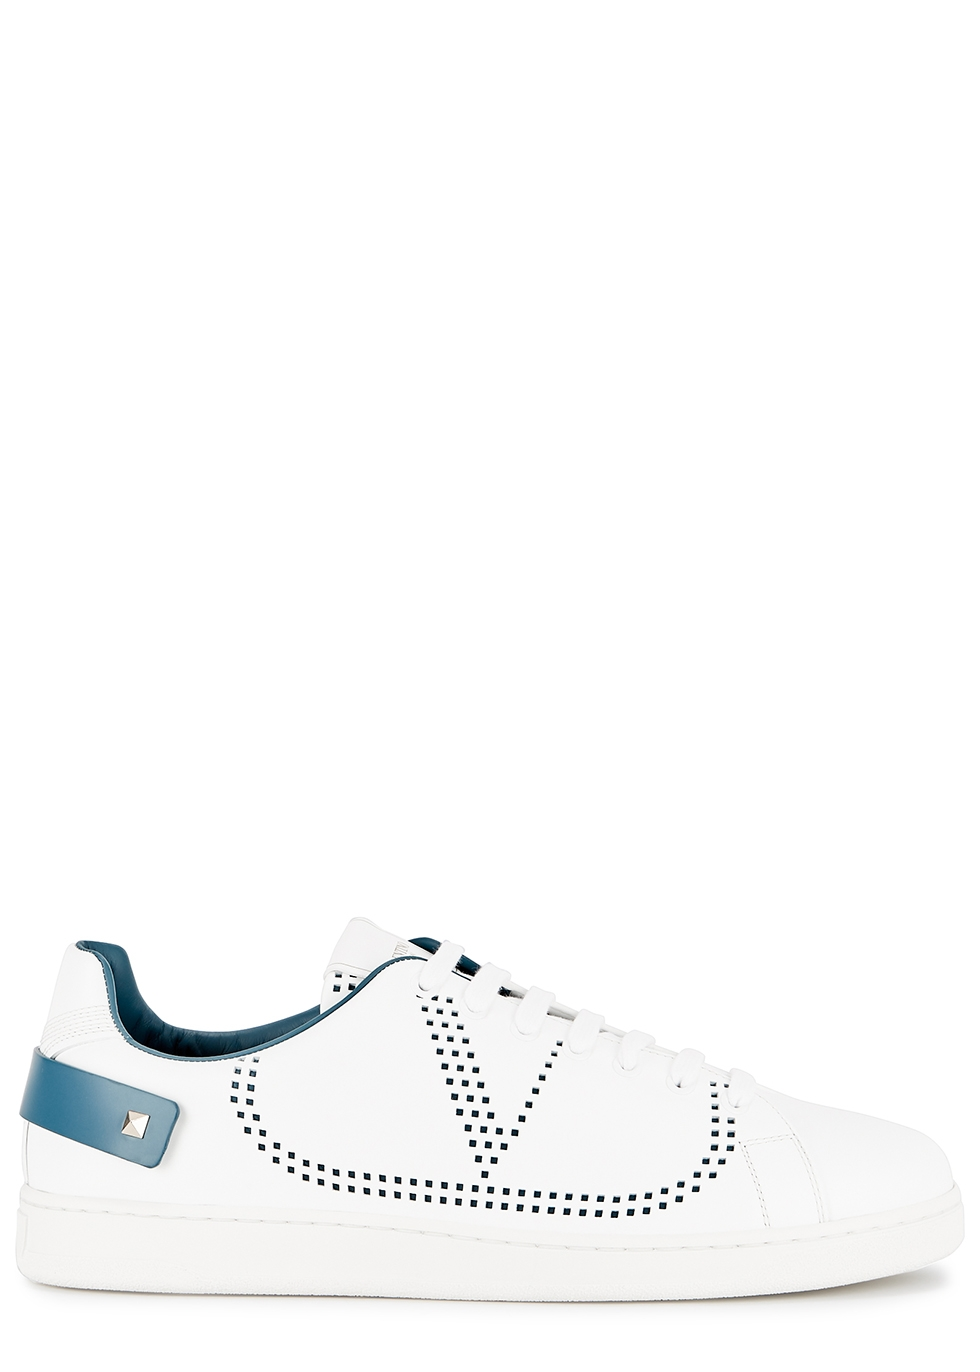 Valentino Garavani white perforated leather sneakers